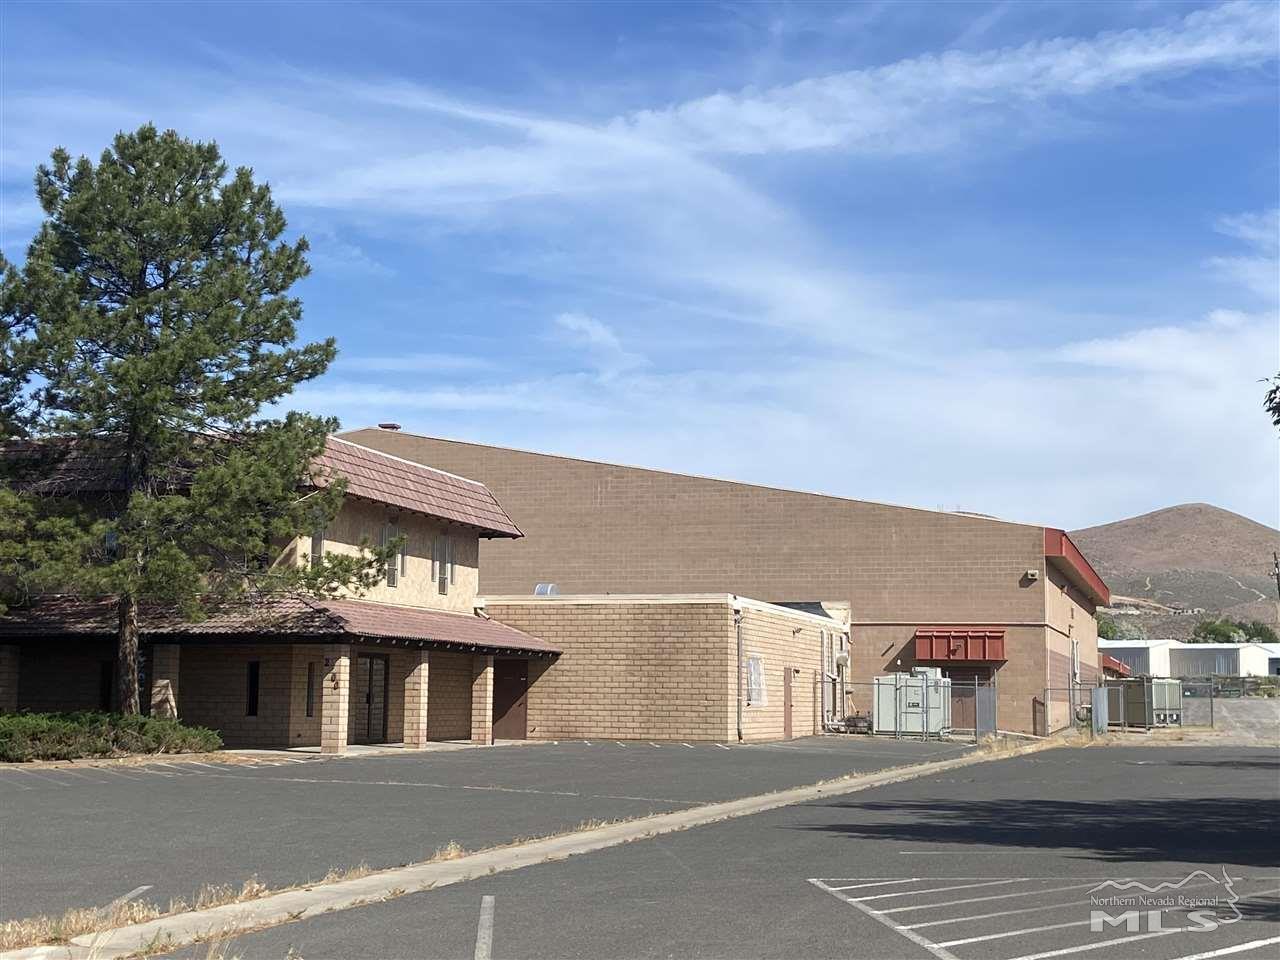 Image for 2800 Lockheed Way, Carson City, NV 89706